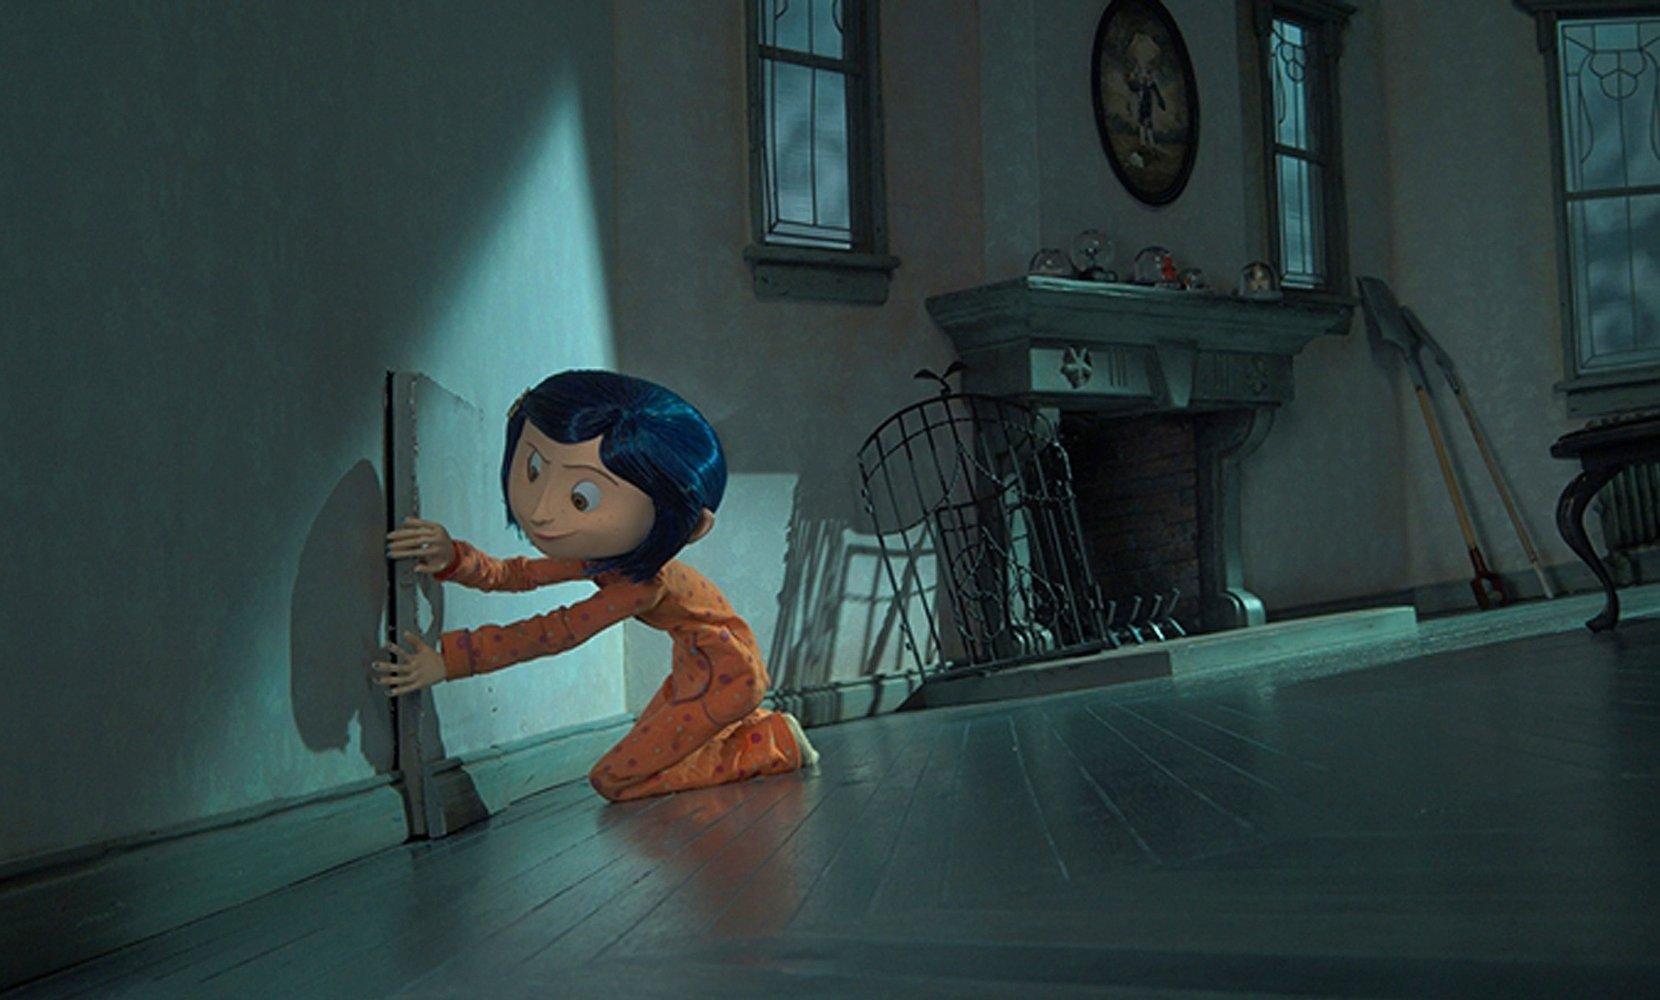 Coraline Free Online Movies Tv Shows At Gomovies